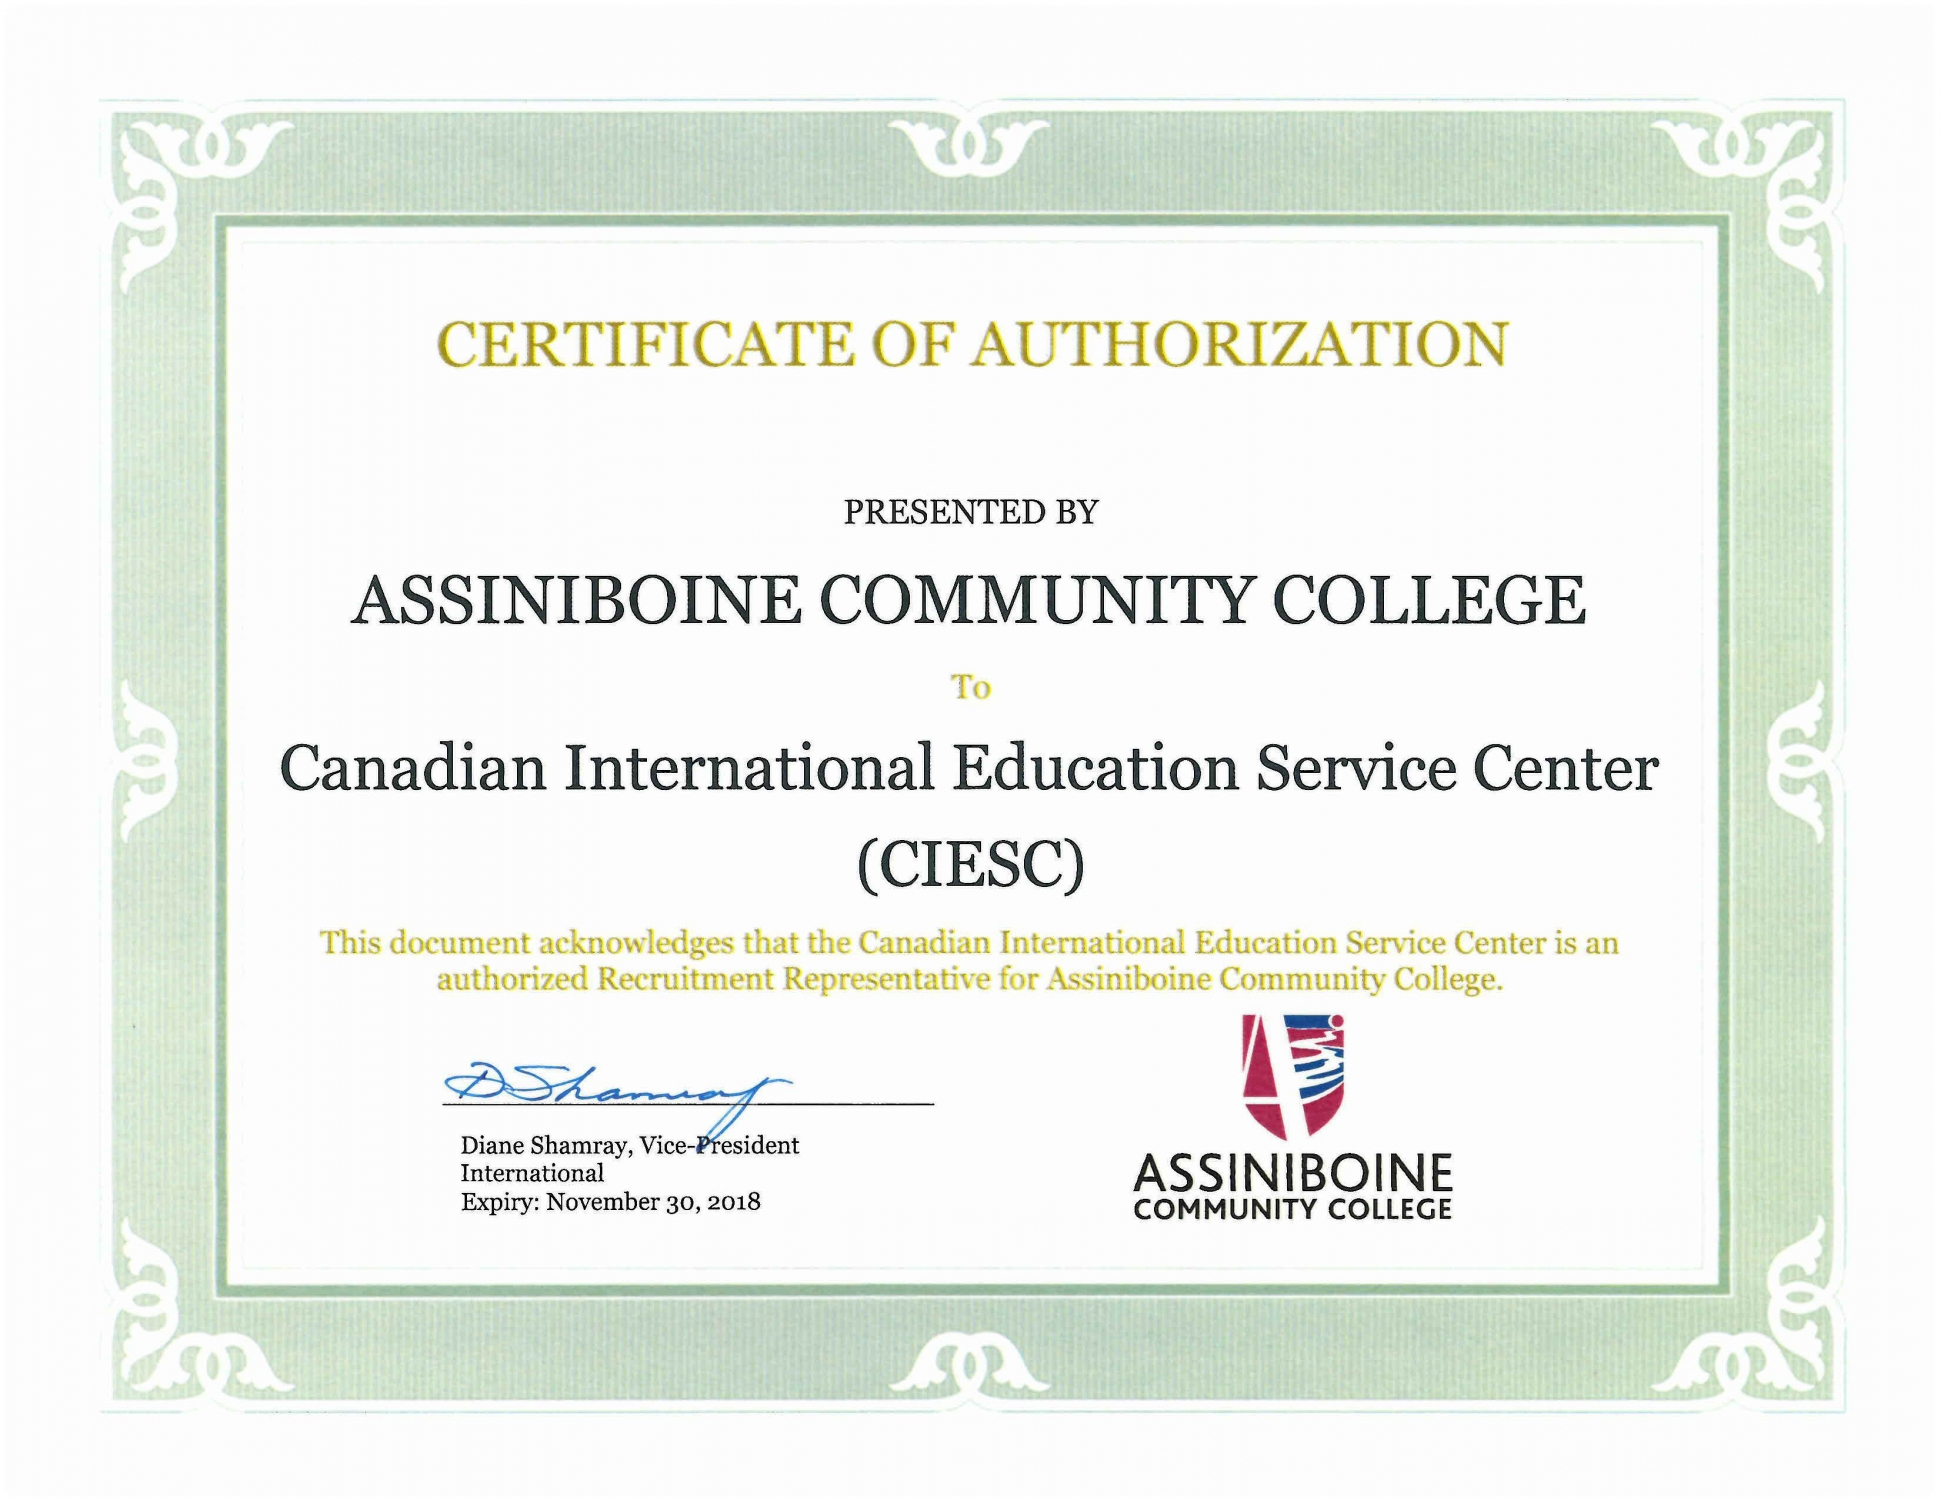 2018 ACC Certificate of Authorization - CIESC